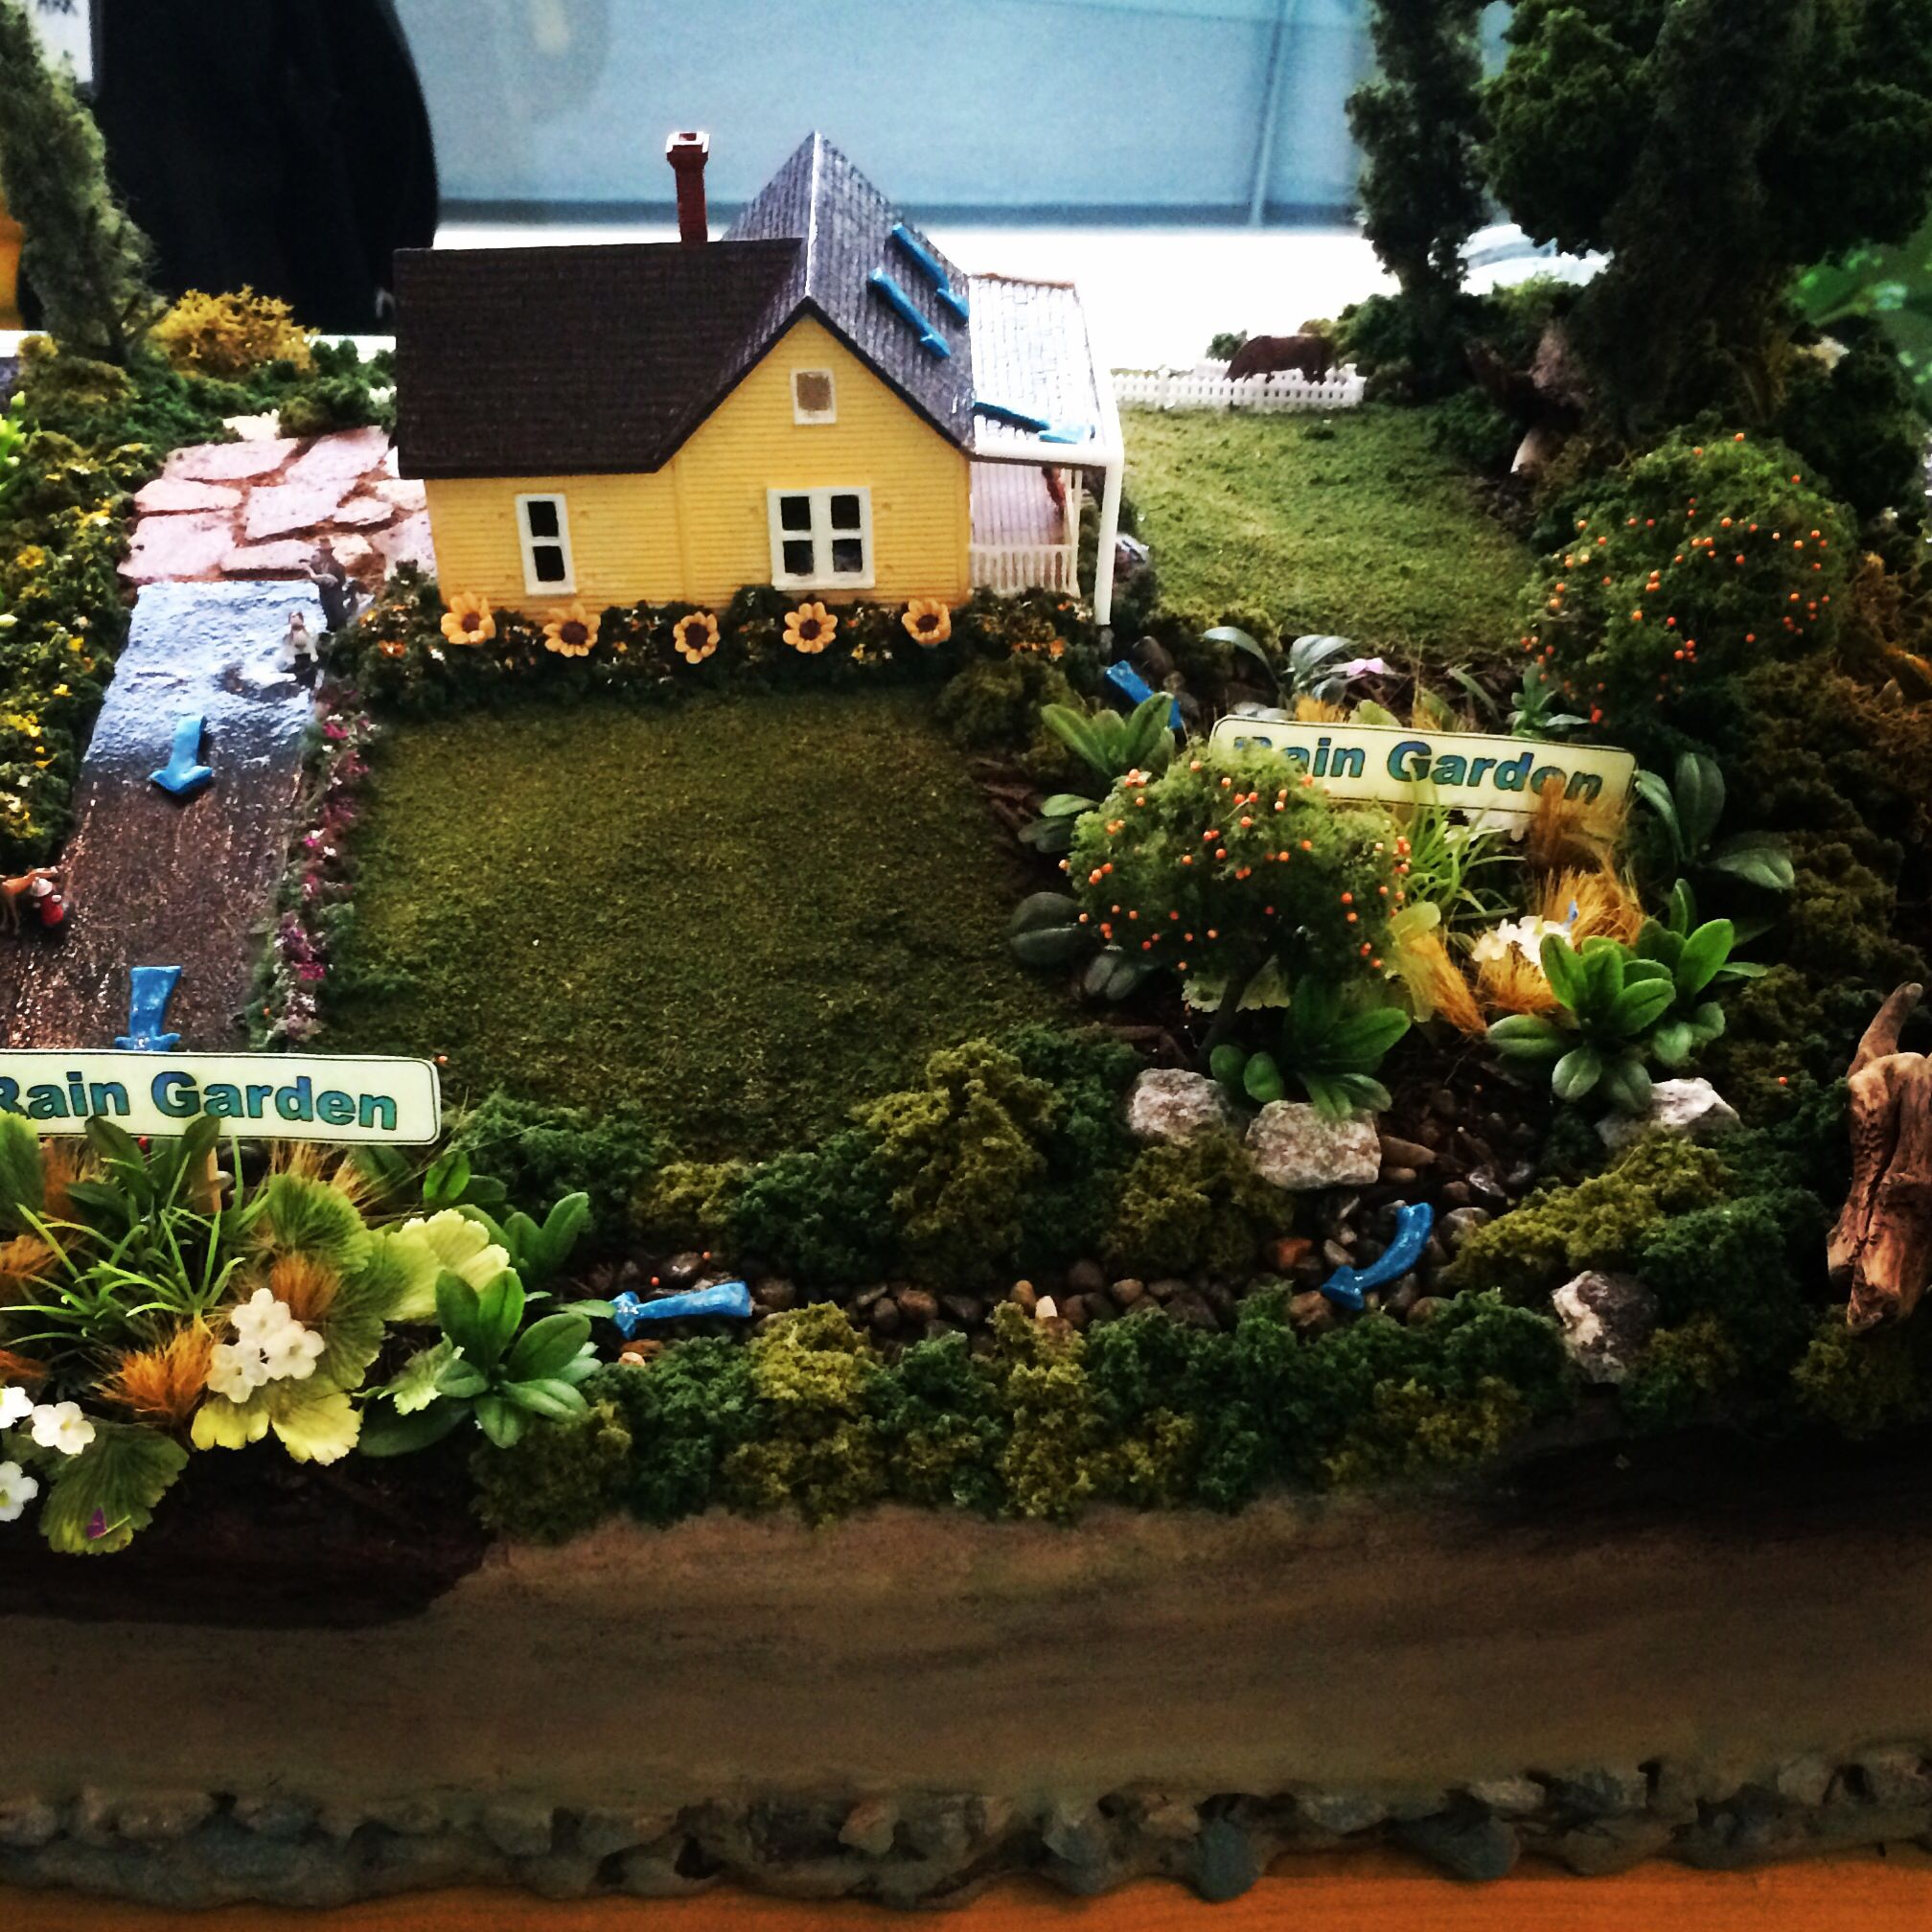 Rain garden diorama | Rain Gardens, Cisterns, Swales and More ...